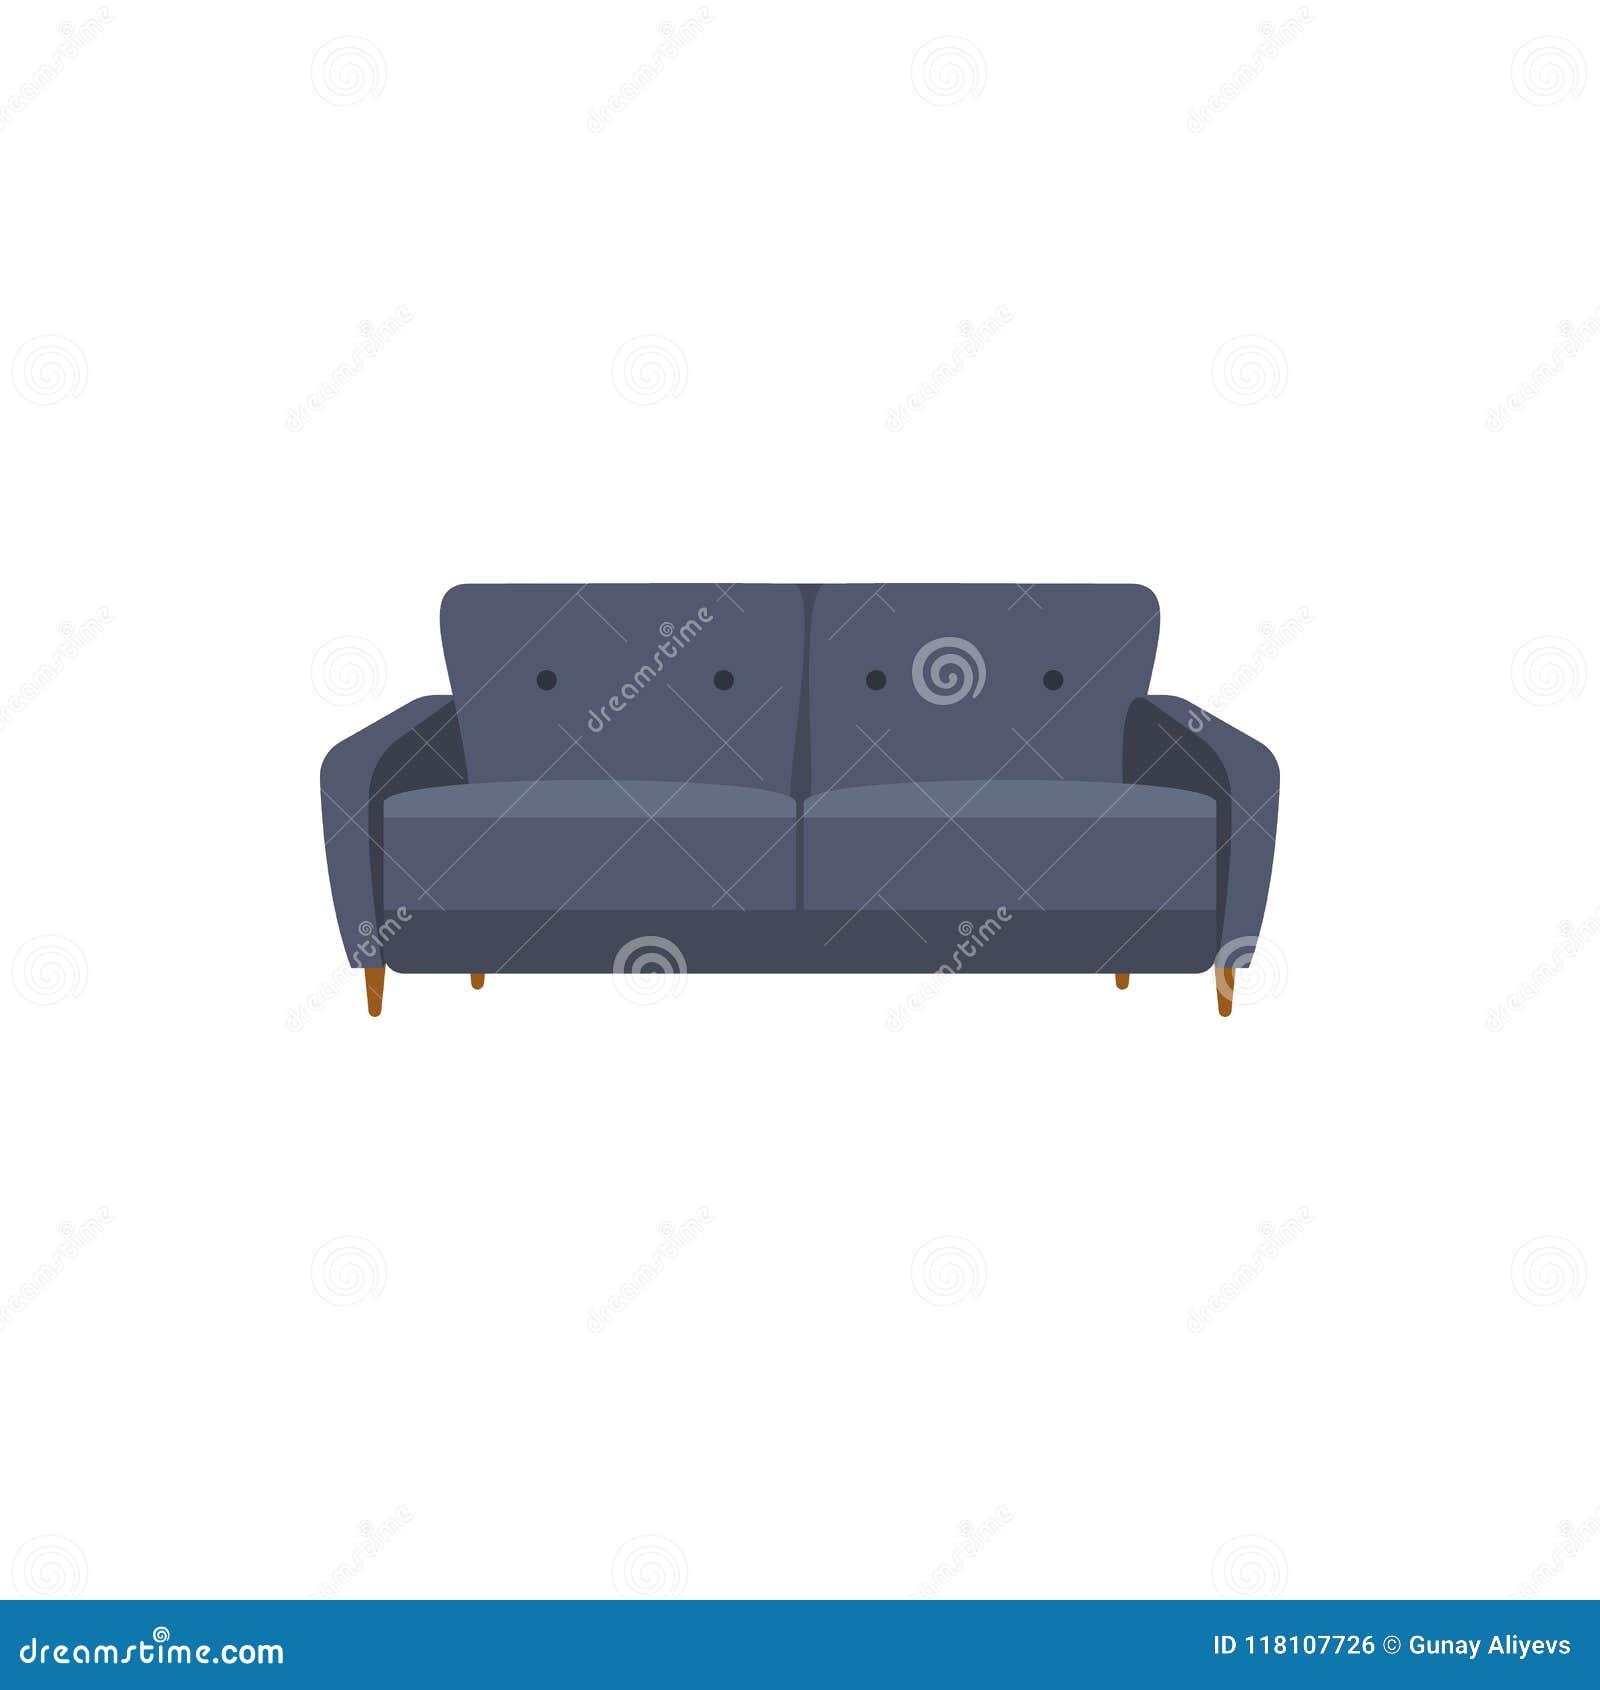 Classic Sofa Flat Icon Interior Or Room Design Template In Flat